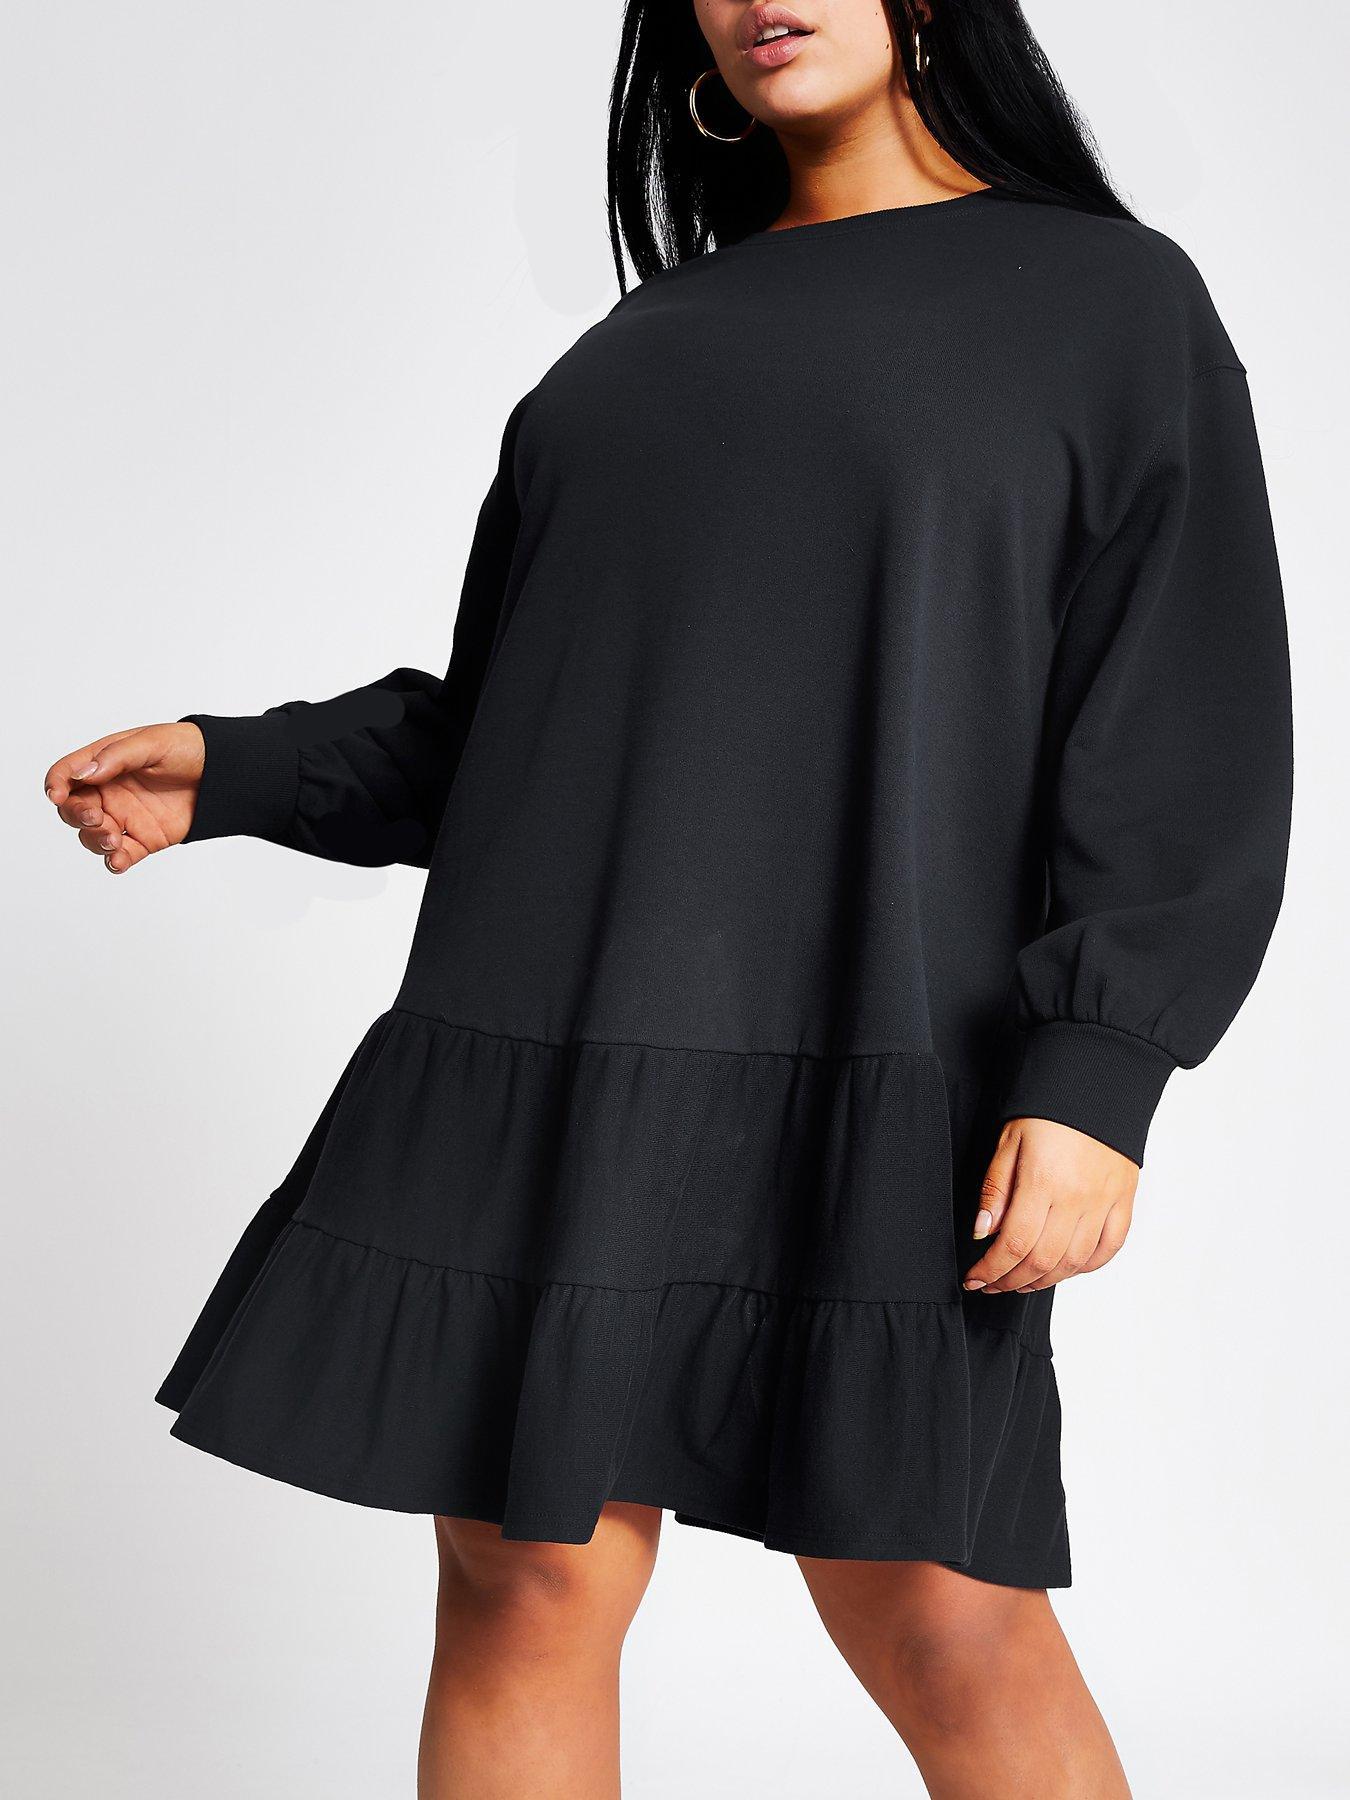 Little Black Dress WHITE COTTON CARDS 18th Birthday Large Keepsake Box